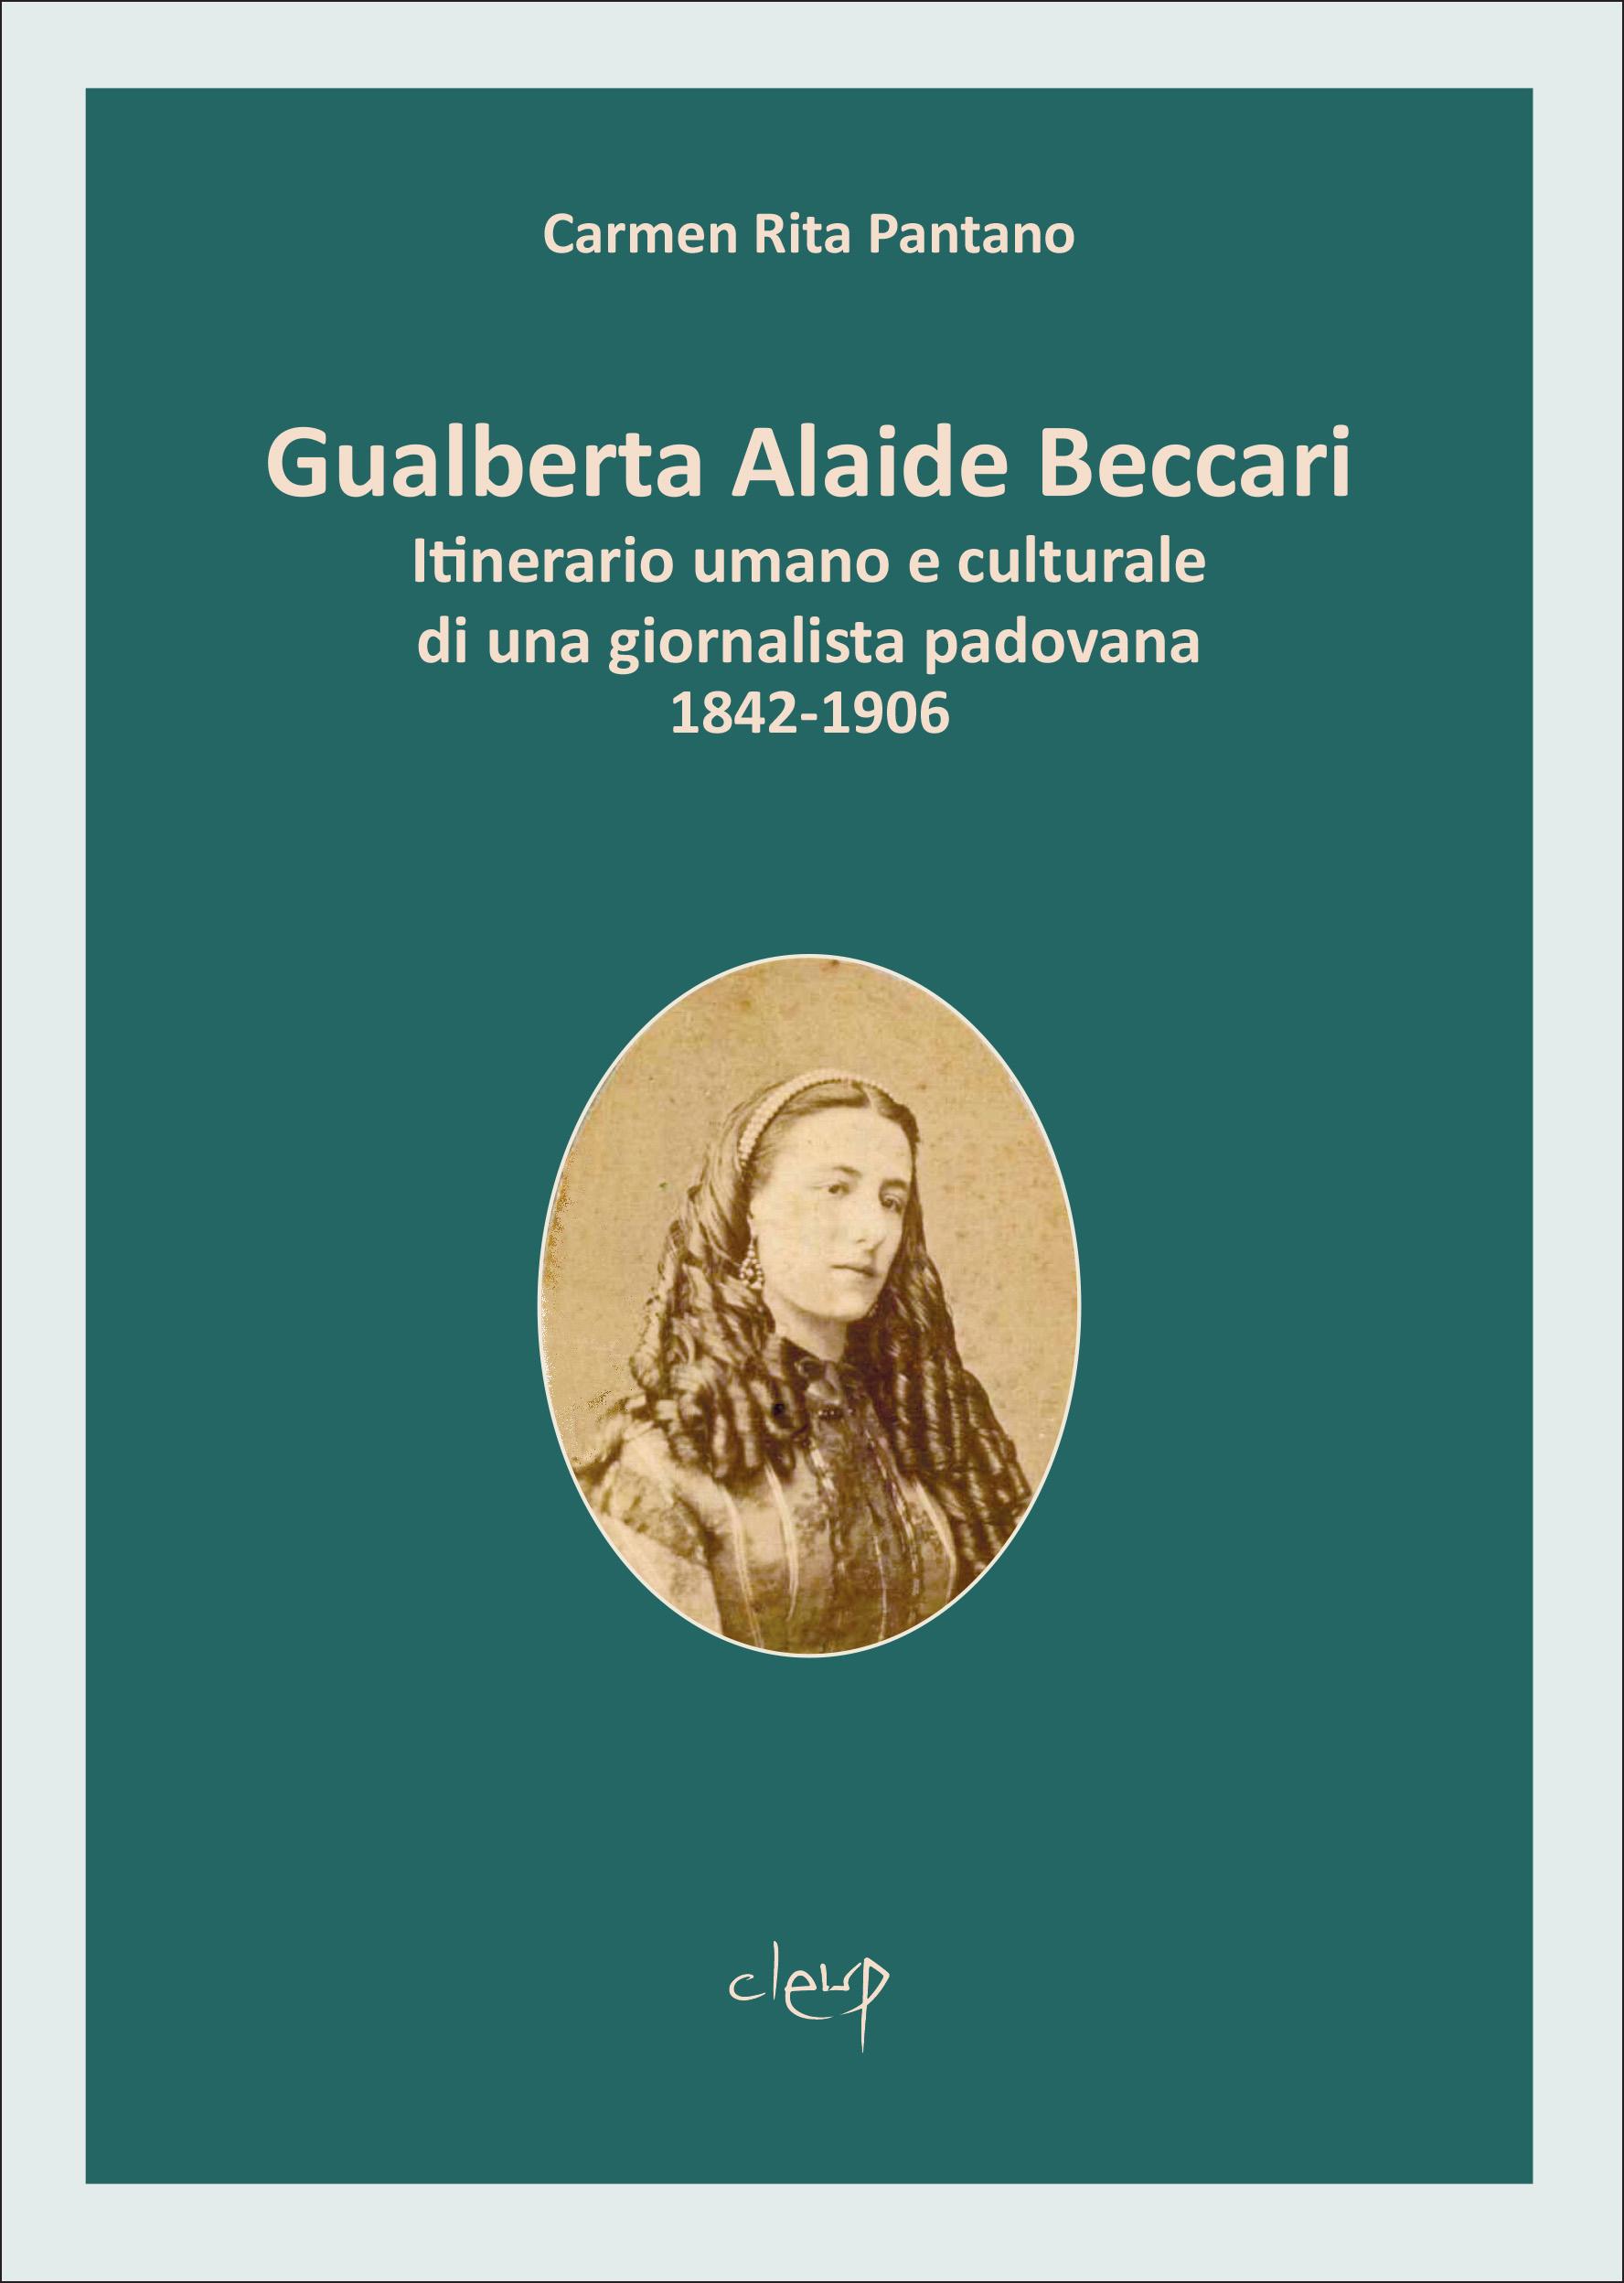 Gualberta Alaide Beccari